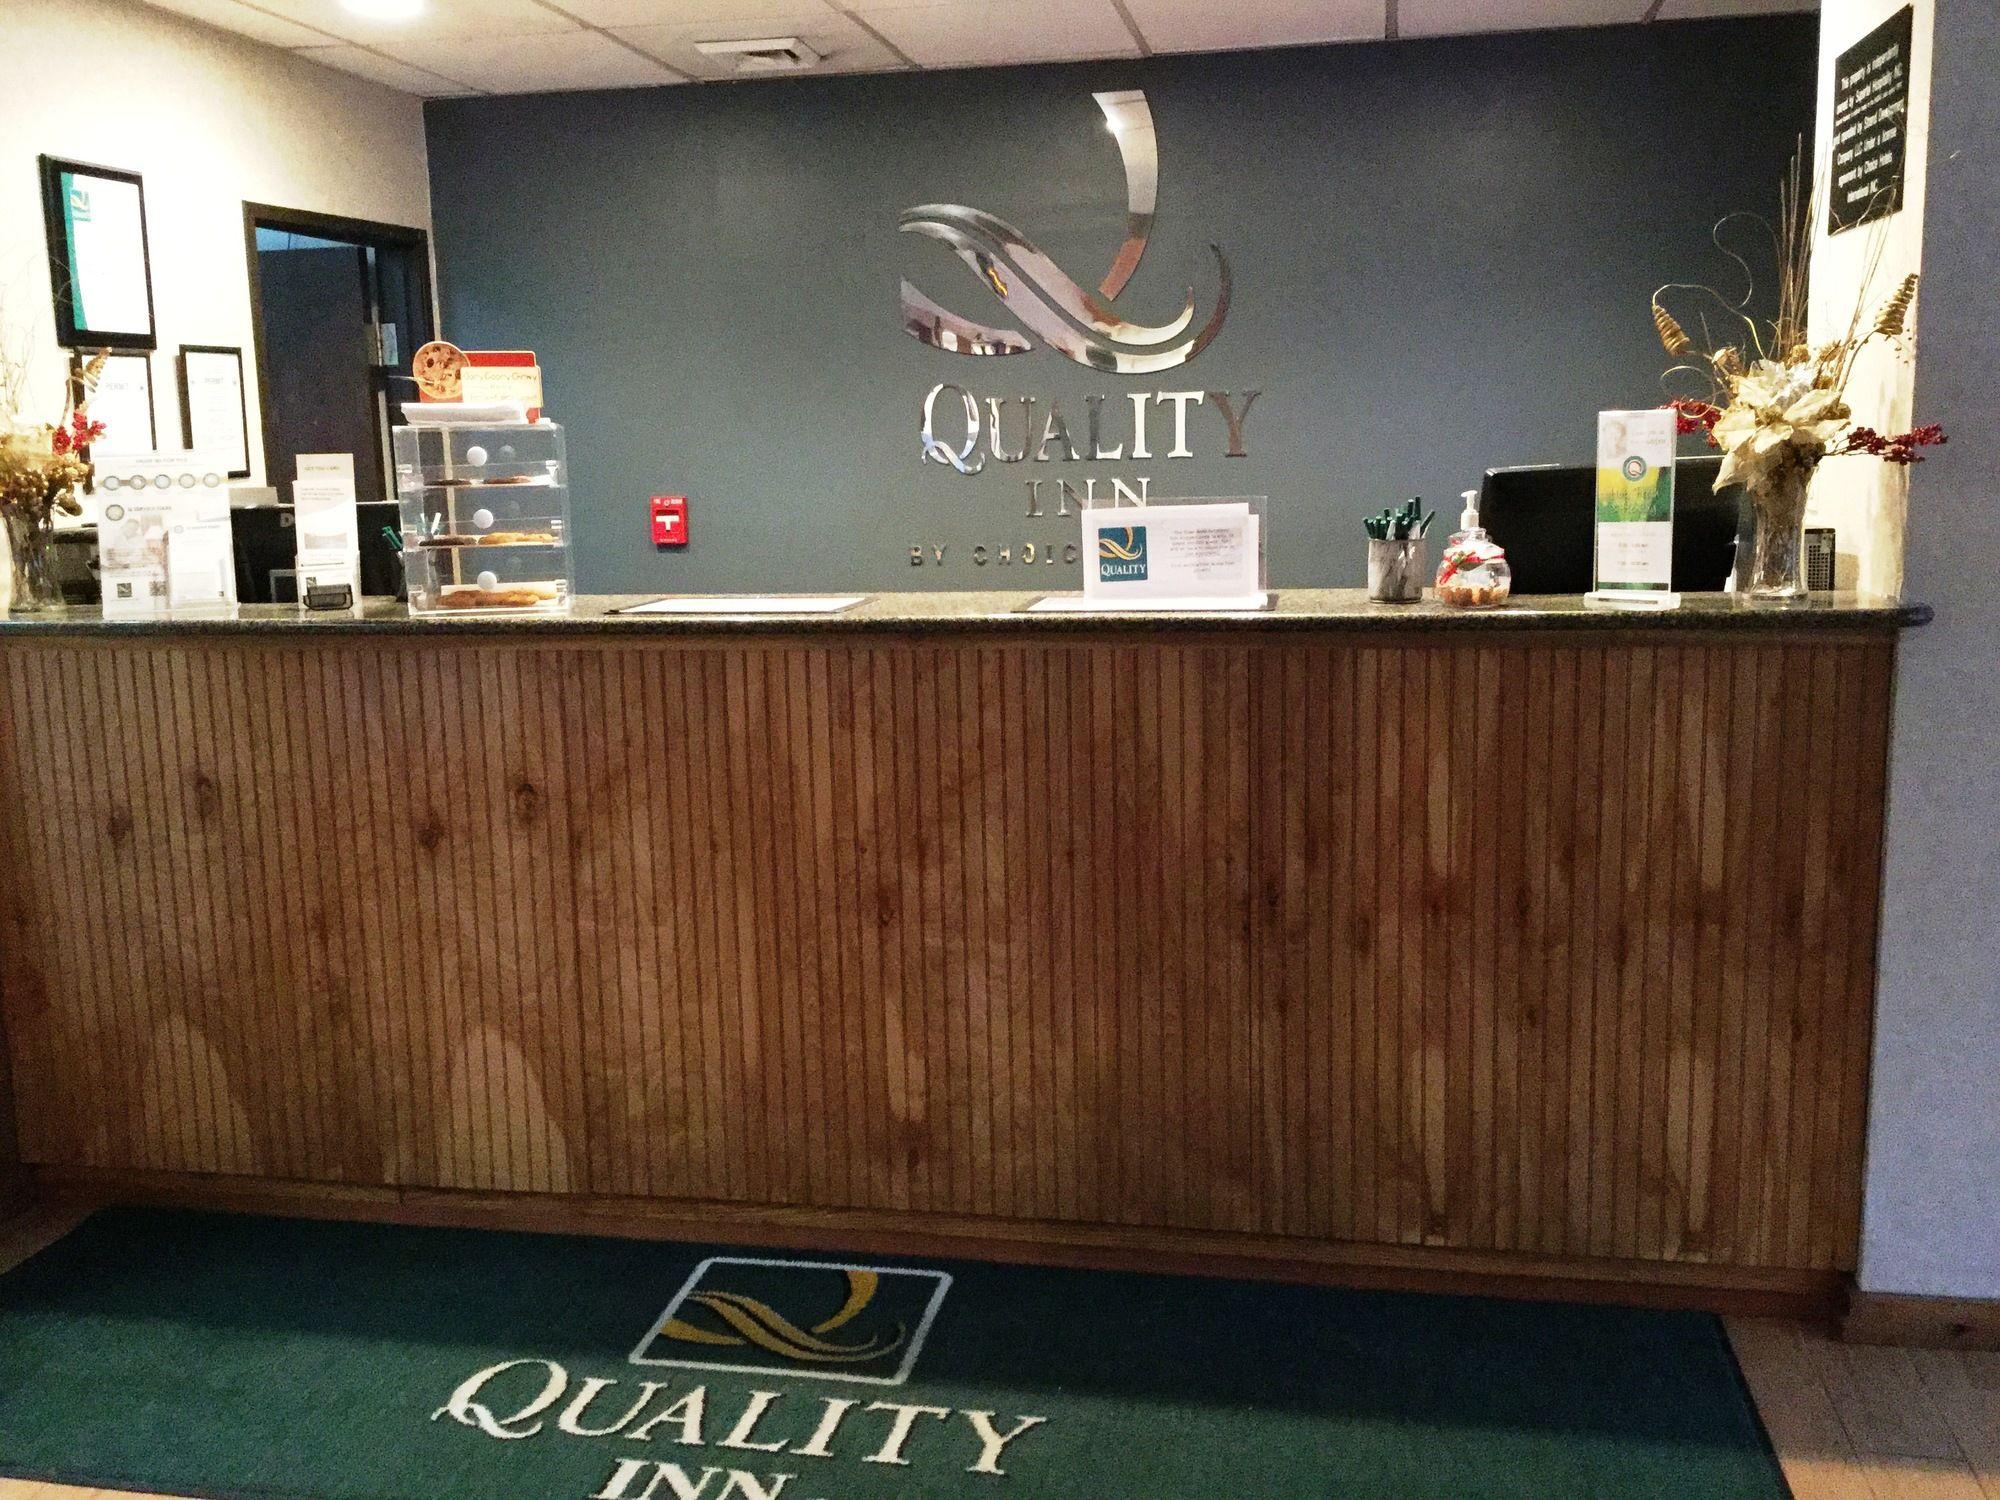 Quality Inn in Morgantown, WV